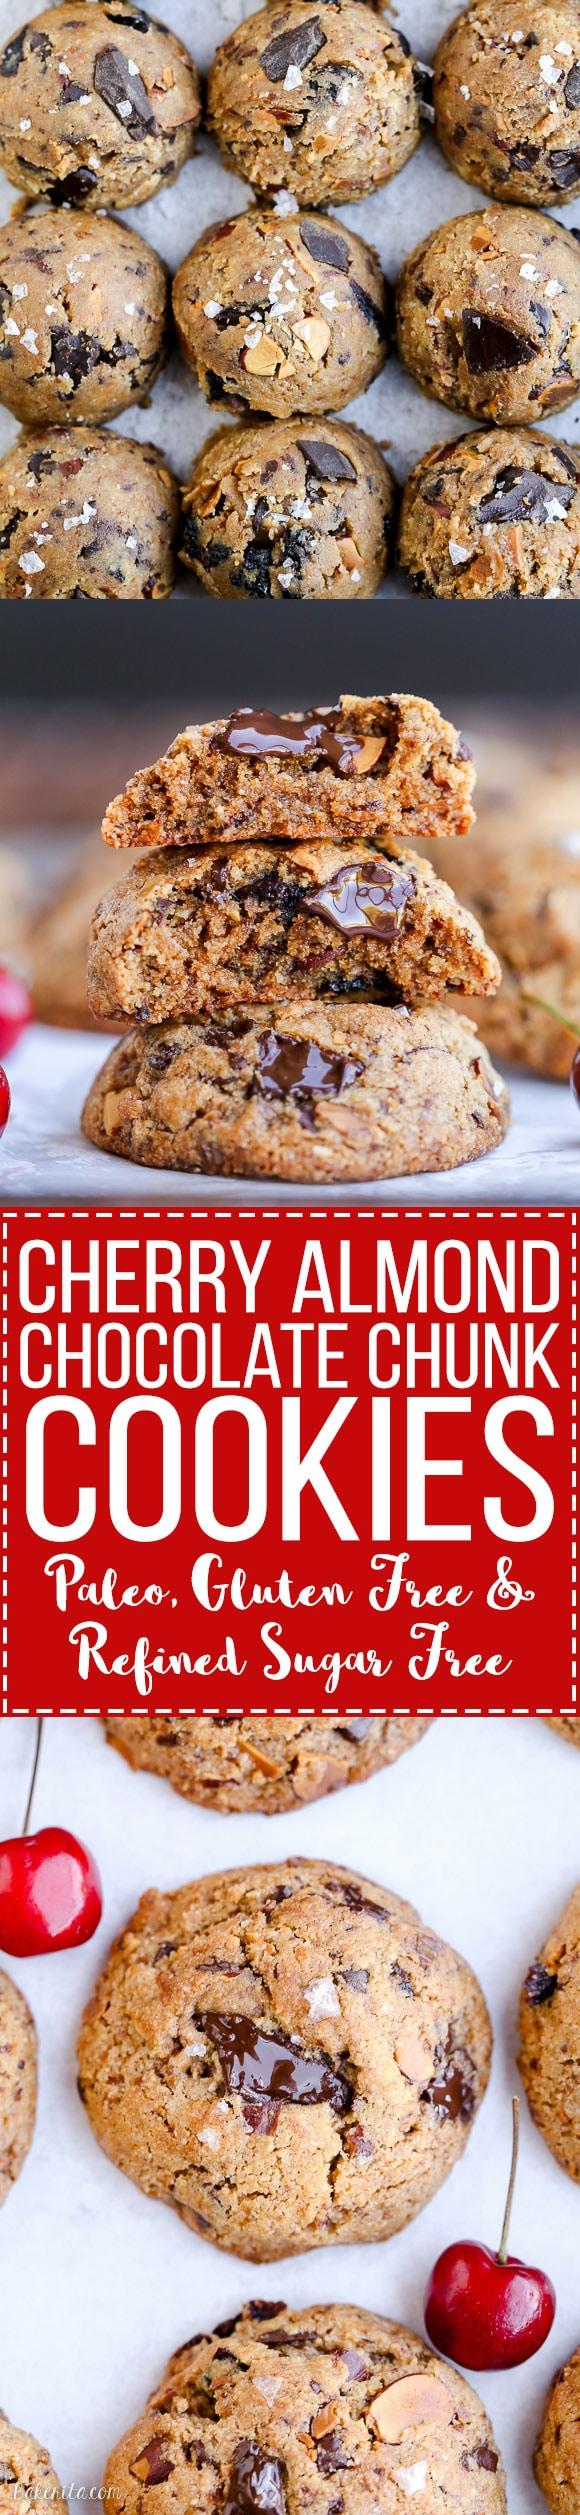 Paleo Cherry Almond Chocolate Chunk Cookies - Bakerita